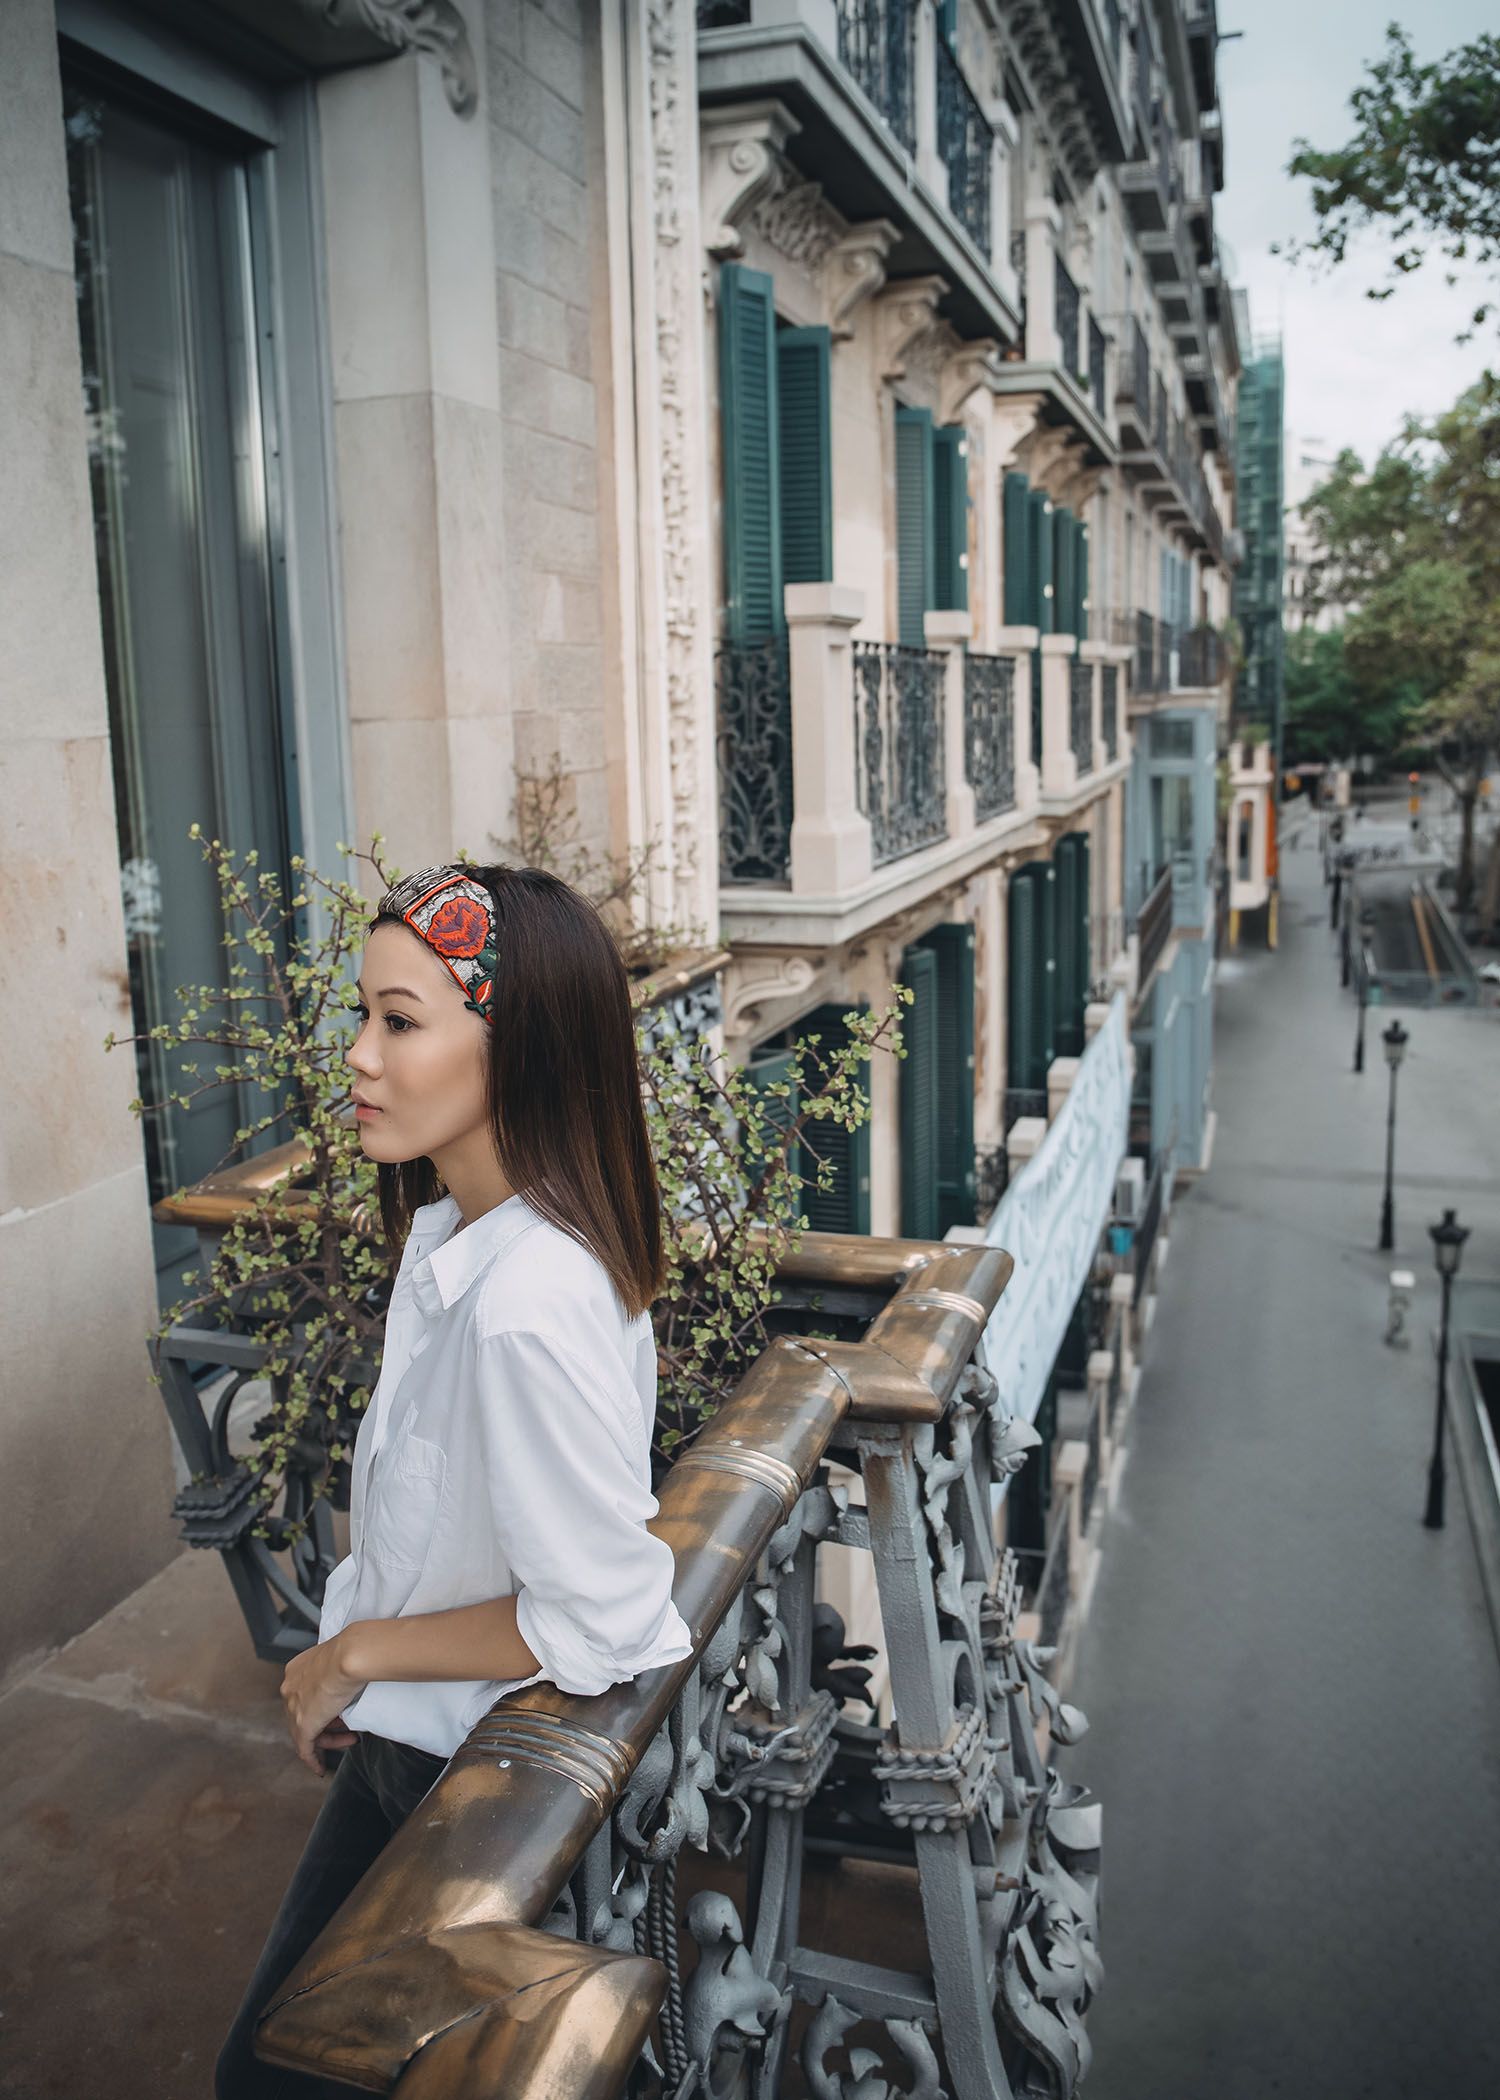 461bd02ac61 Lifestyle fashion travel blogger Jenny Tsang of Tsangtastic wearing off  Gucci headband white button down shirt